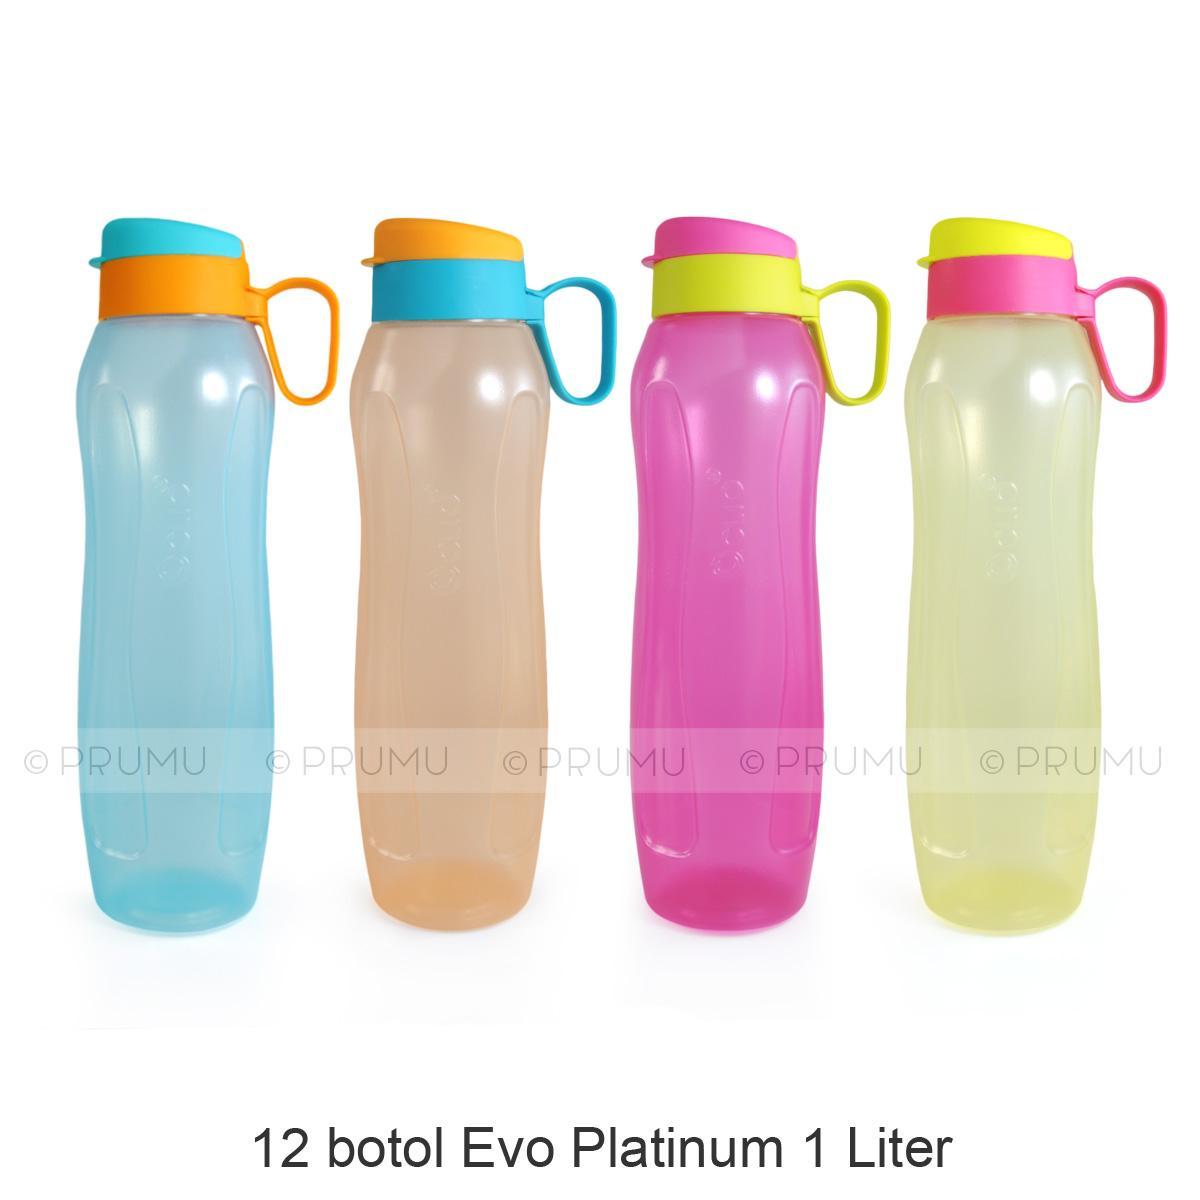 GROSIR Botol Minum 500 ml - Botol Minum Anak - Souvenir Ulang Tahun - Evo Platinum